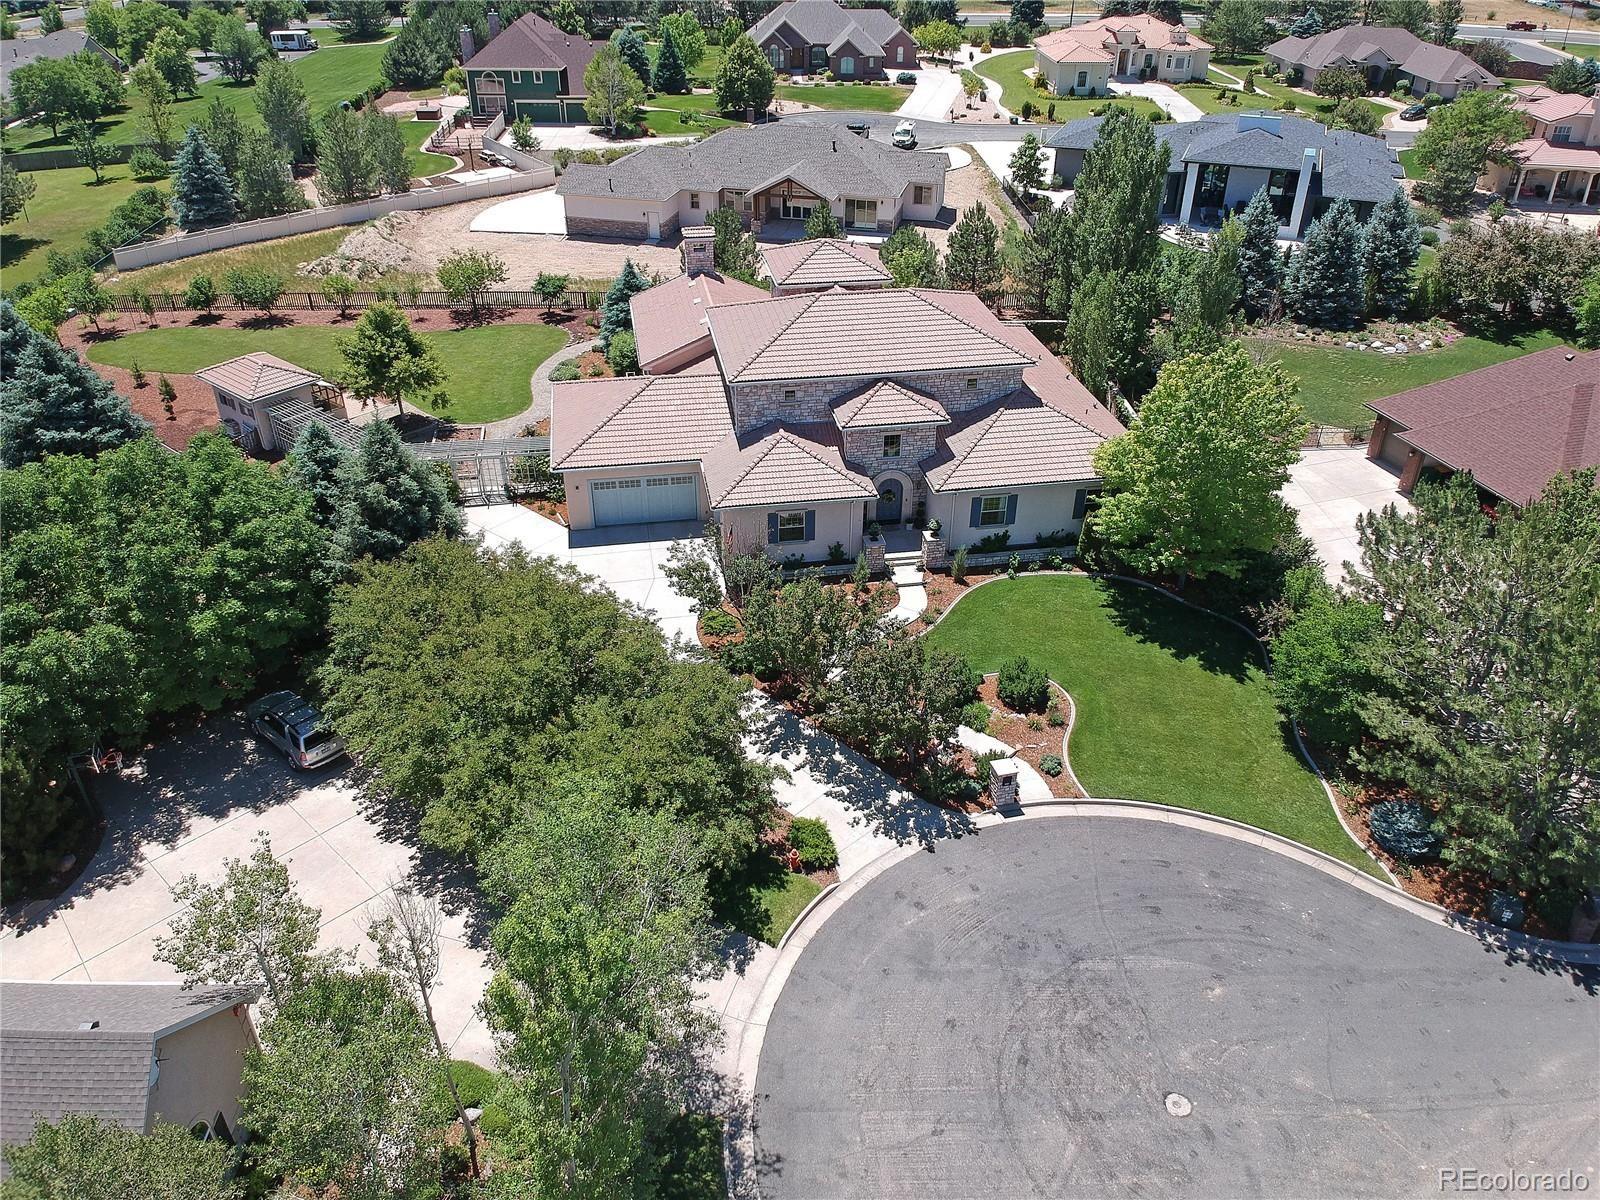 3938 18th Street Lane, Greeley, CO 80634 - MLS#: 9605613